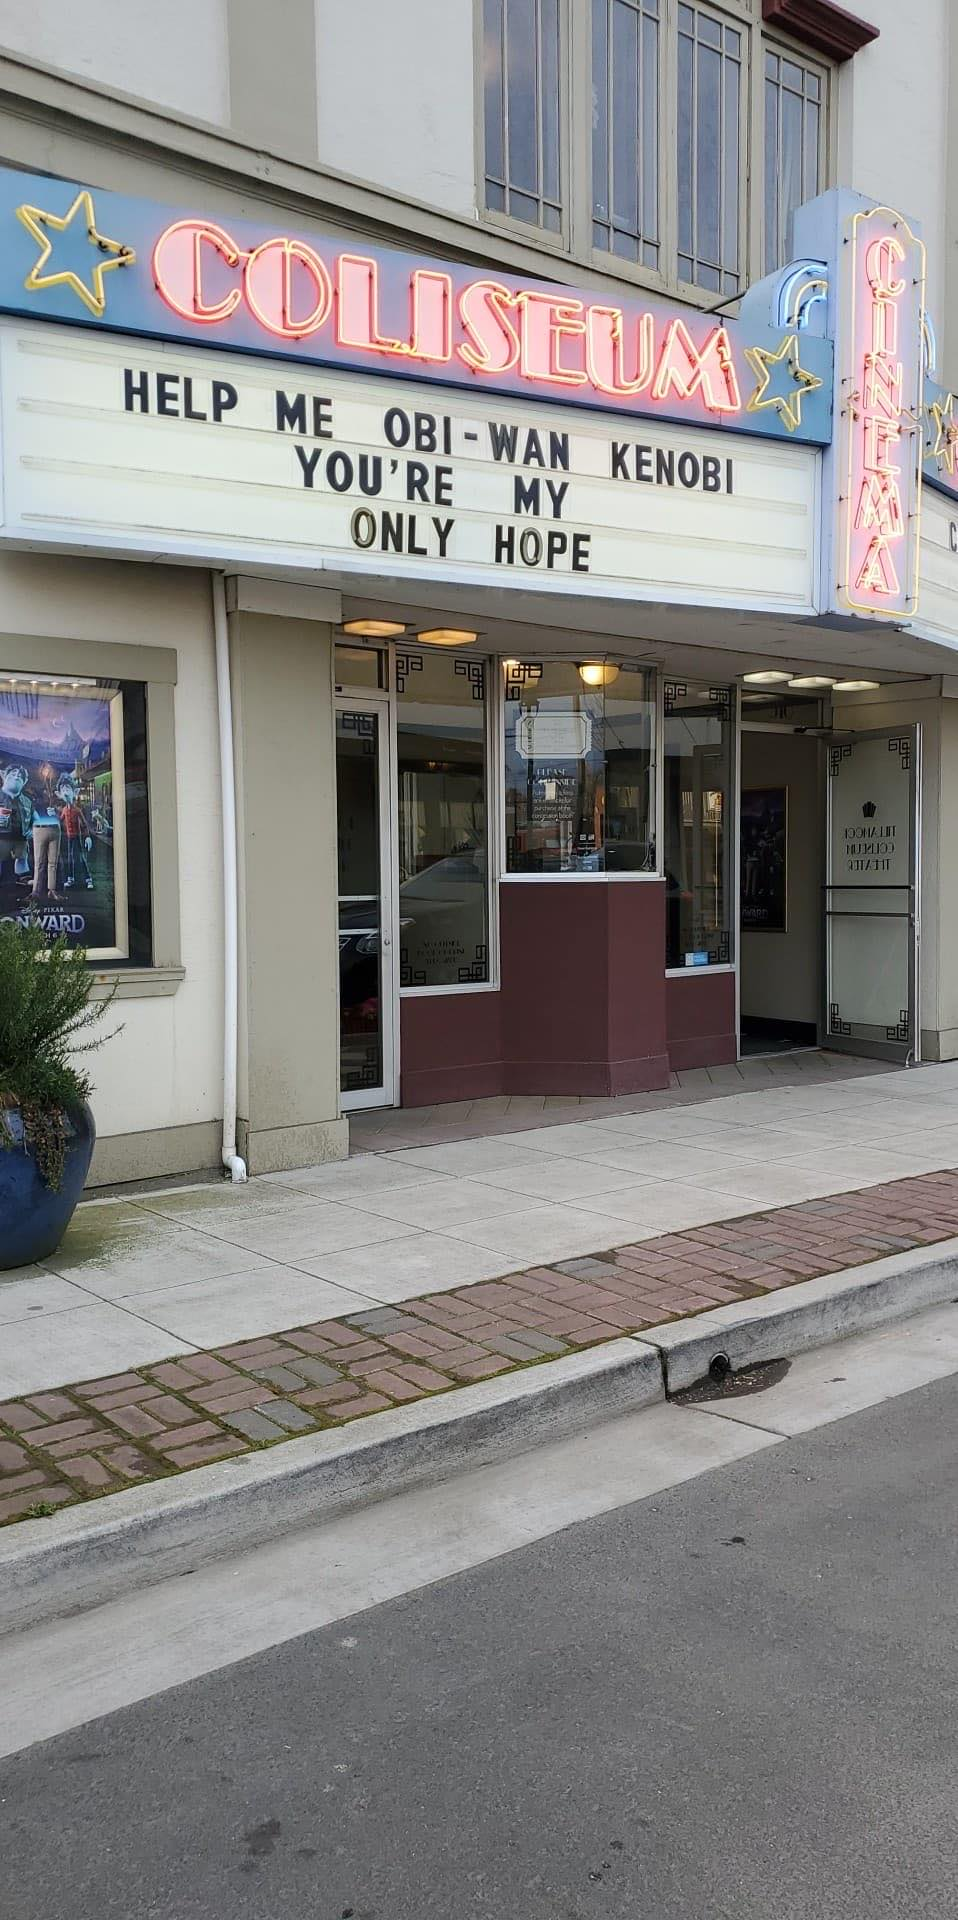 Tillamook Coliseum Theater.jpg